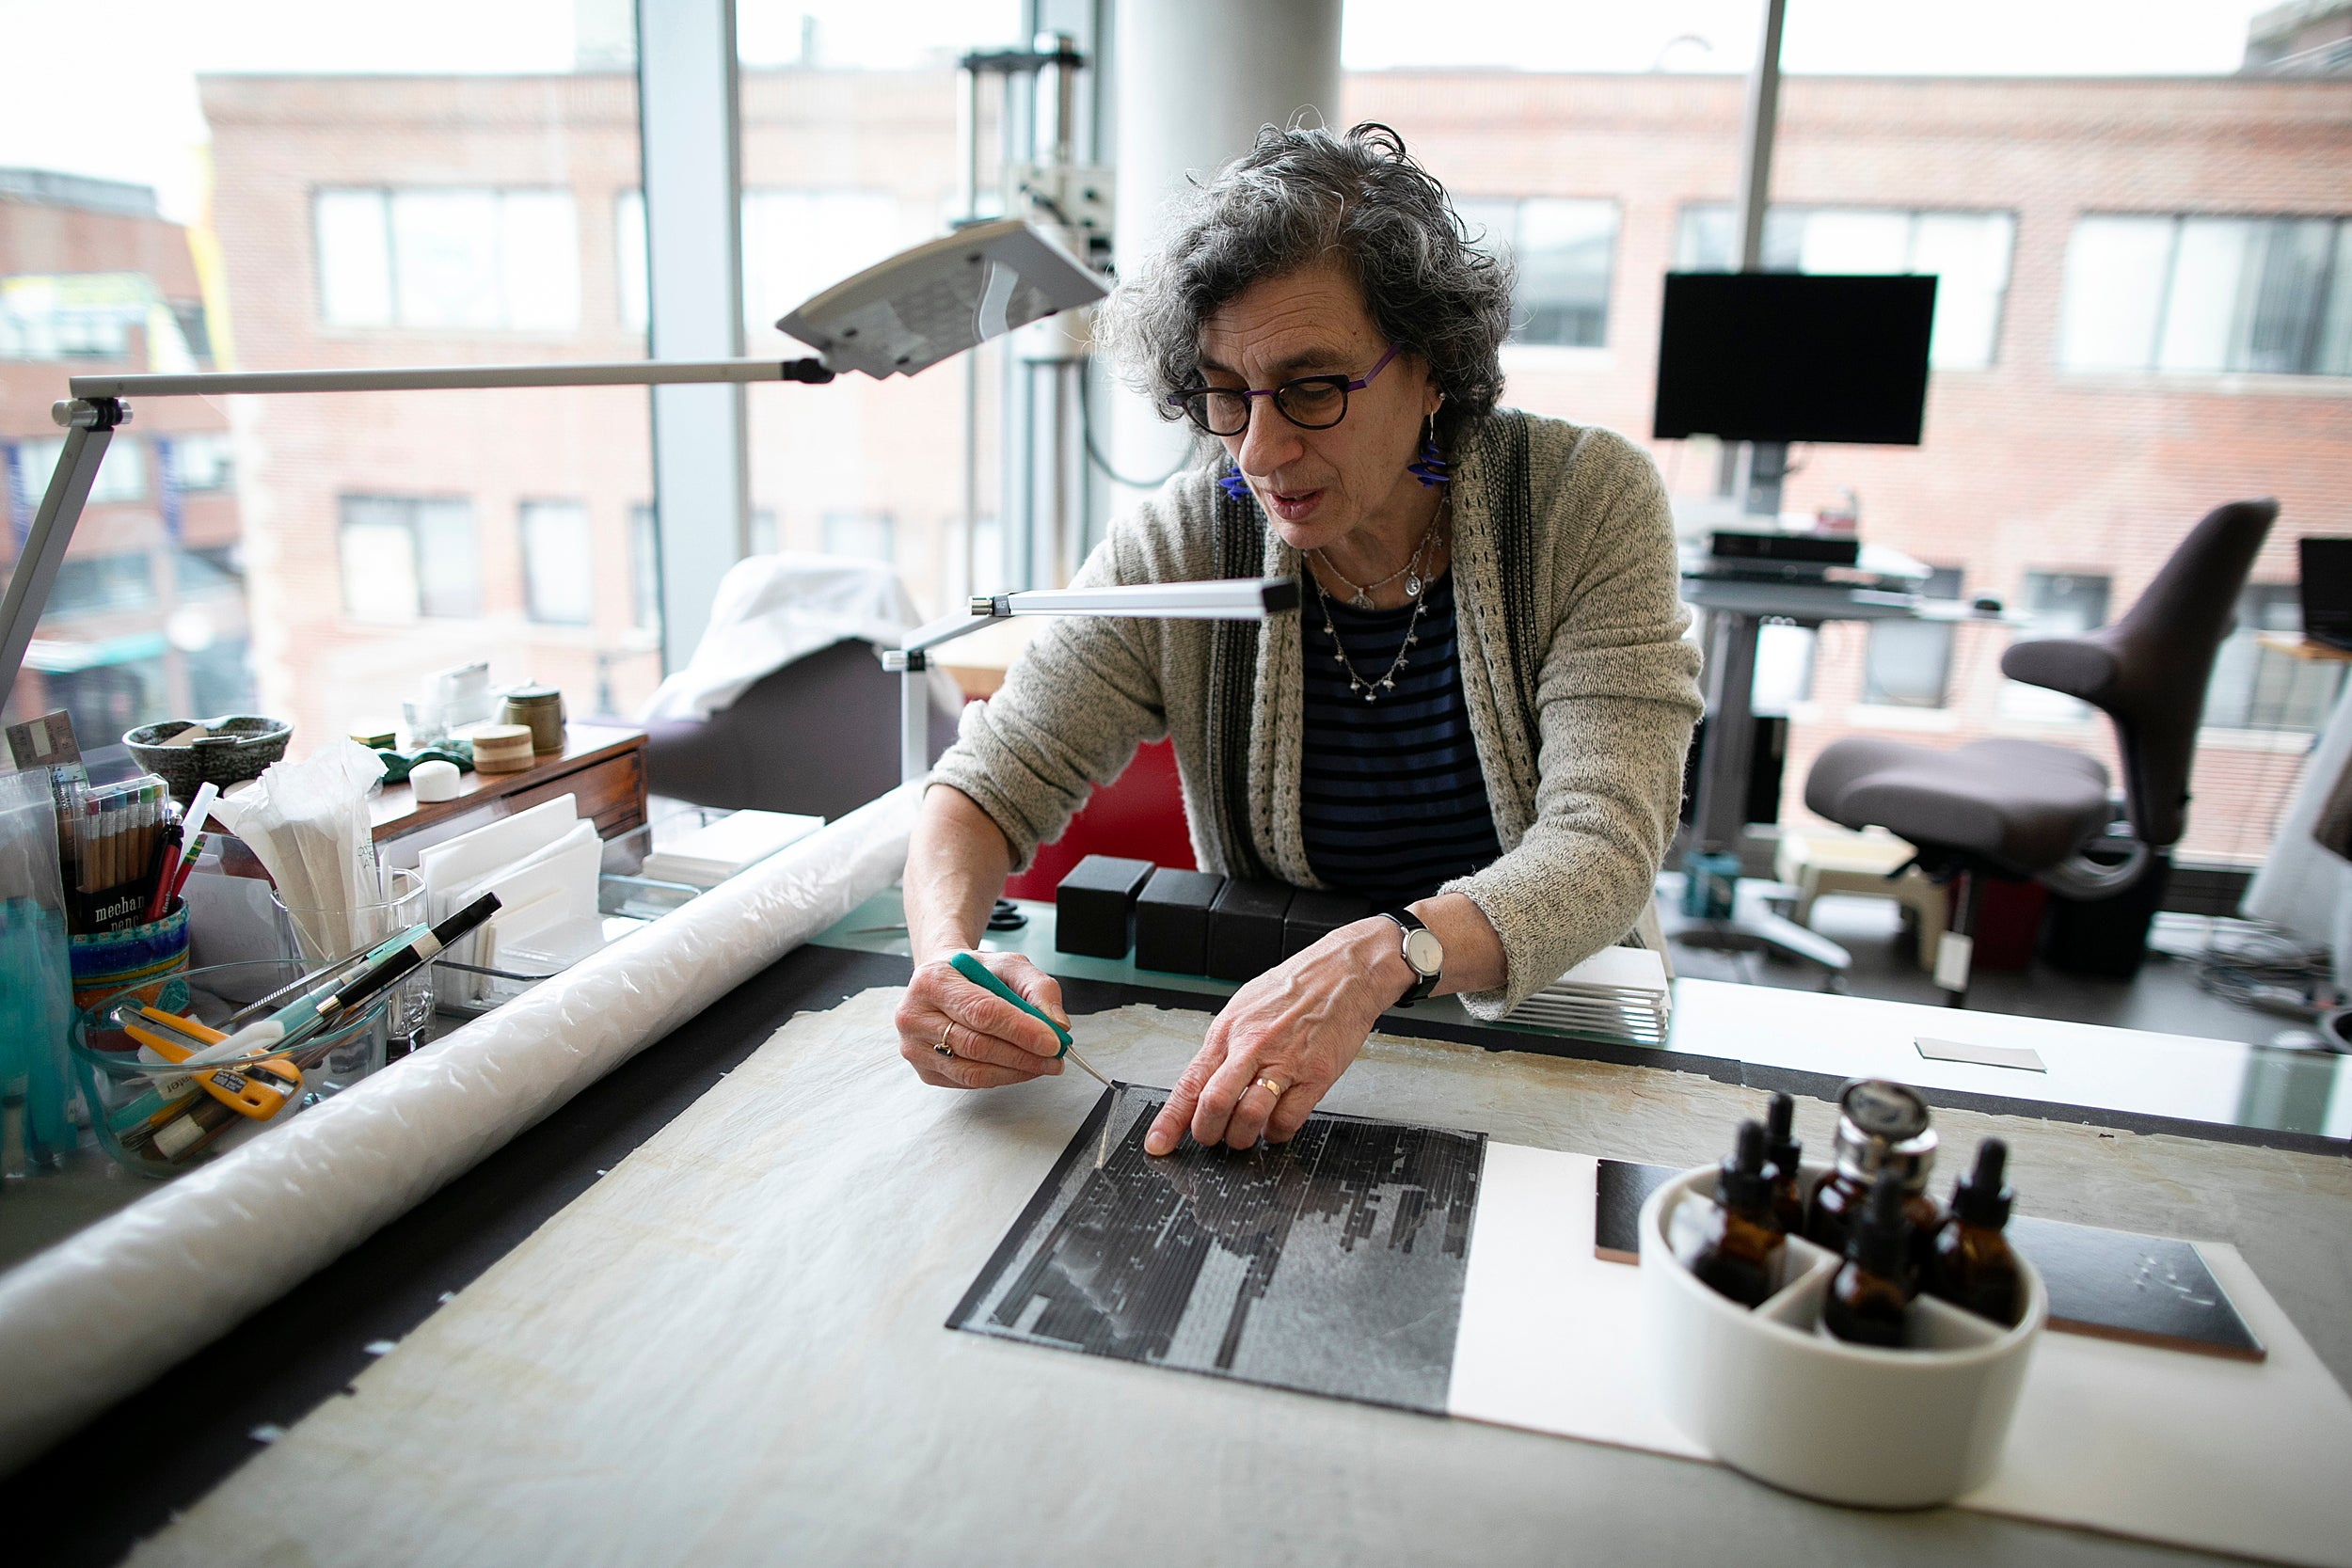 Debora Mayer is pictured working in the center.